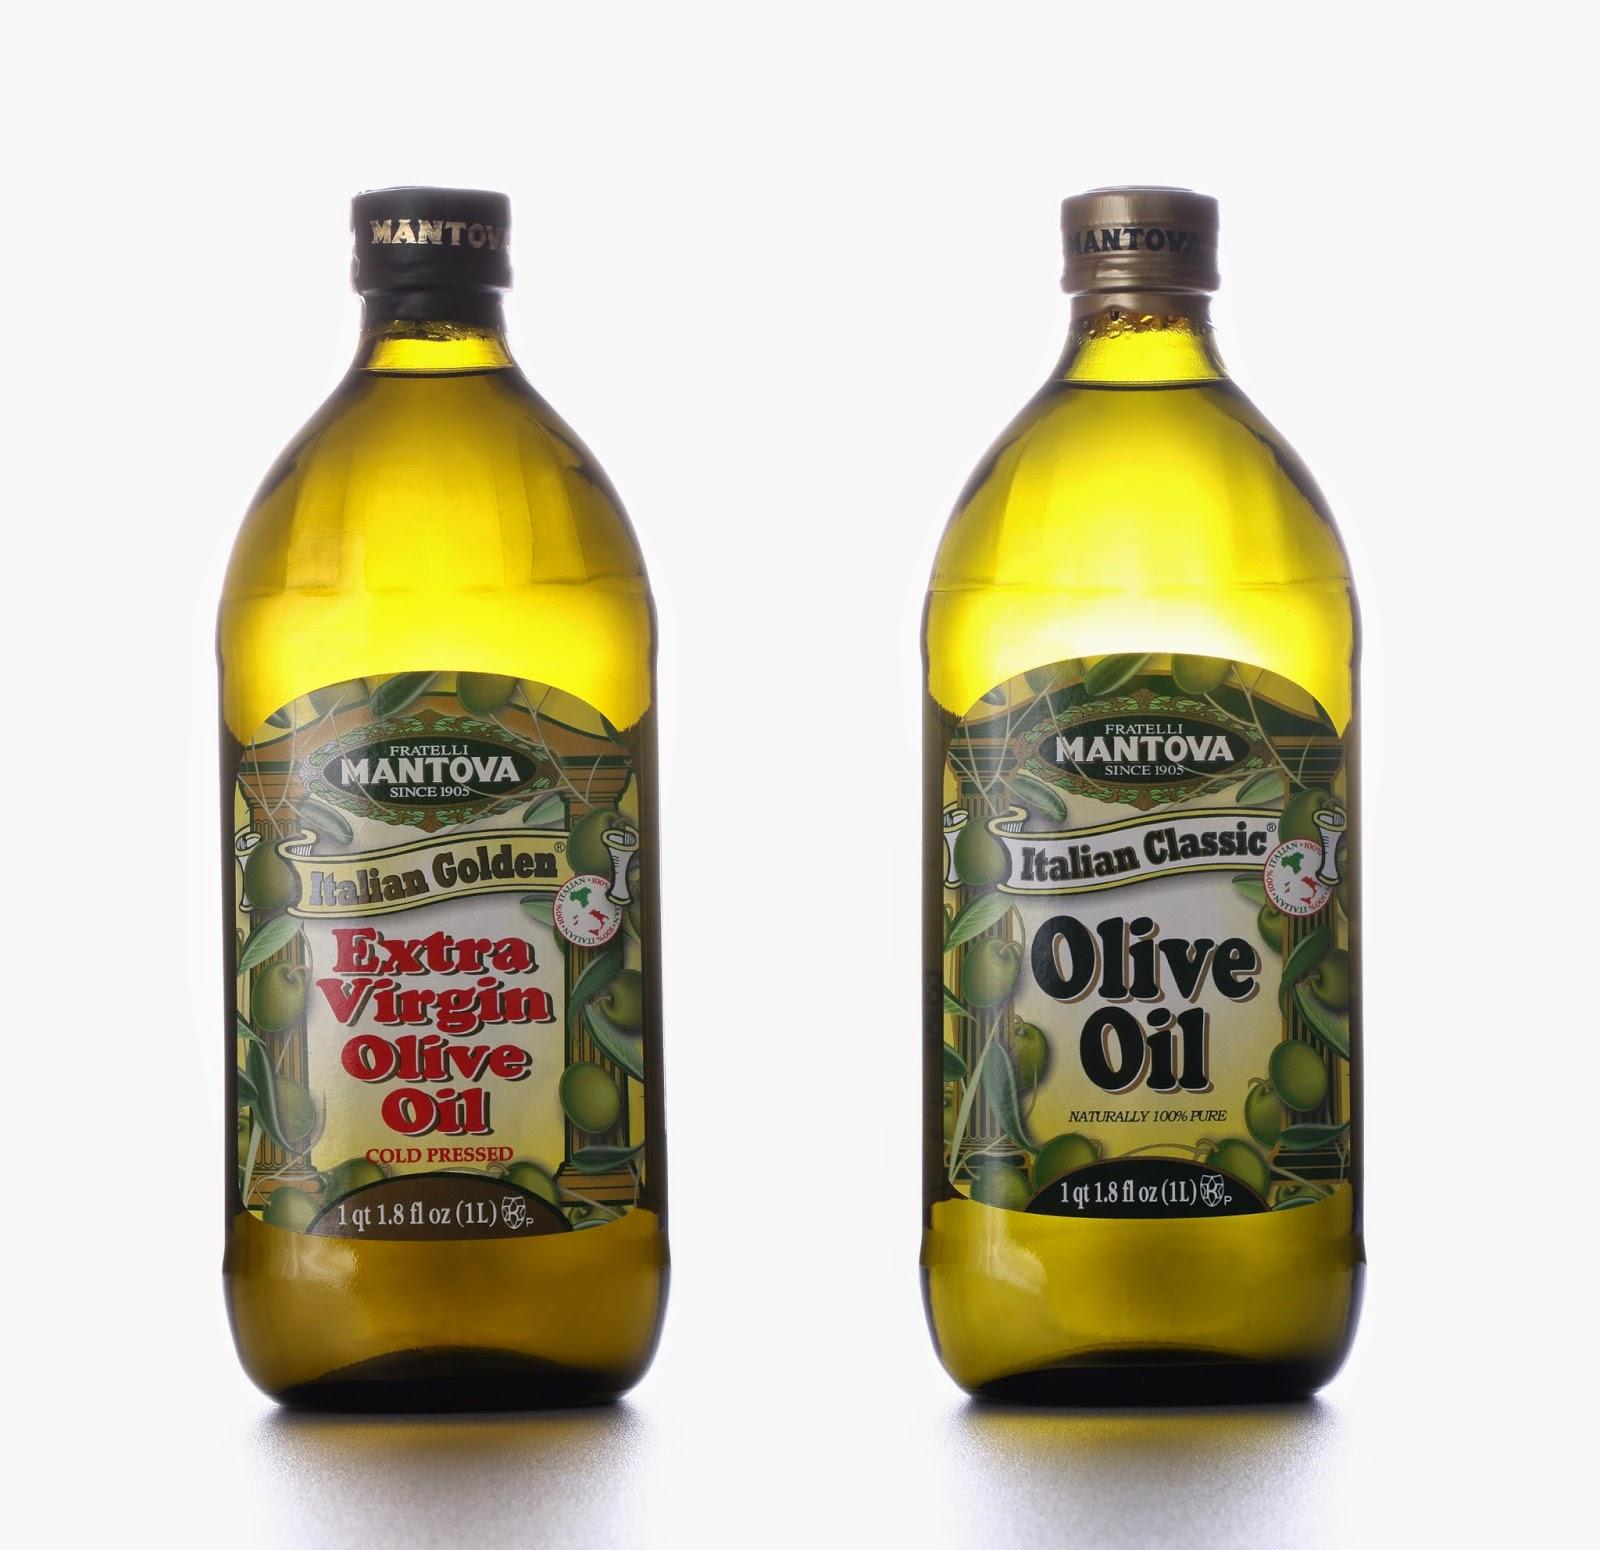 MANTOVA兩款產品「特級橄欖油」(Golden Extra Virgin Olive Oil)和「一般橄欖油」(Classic Olive Oil)深入家庭、廣受歡迎。